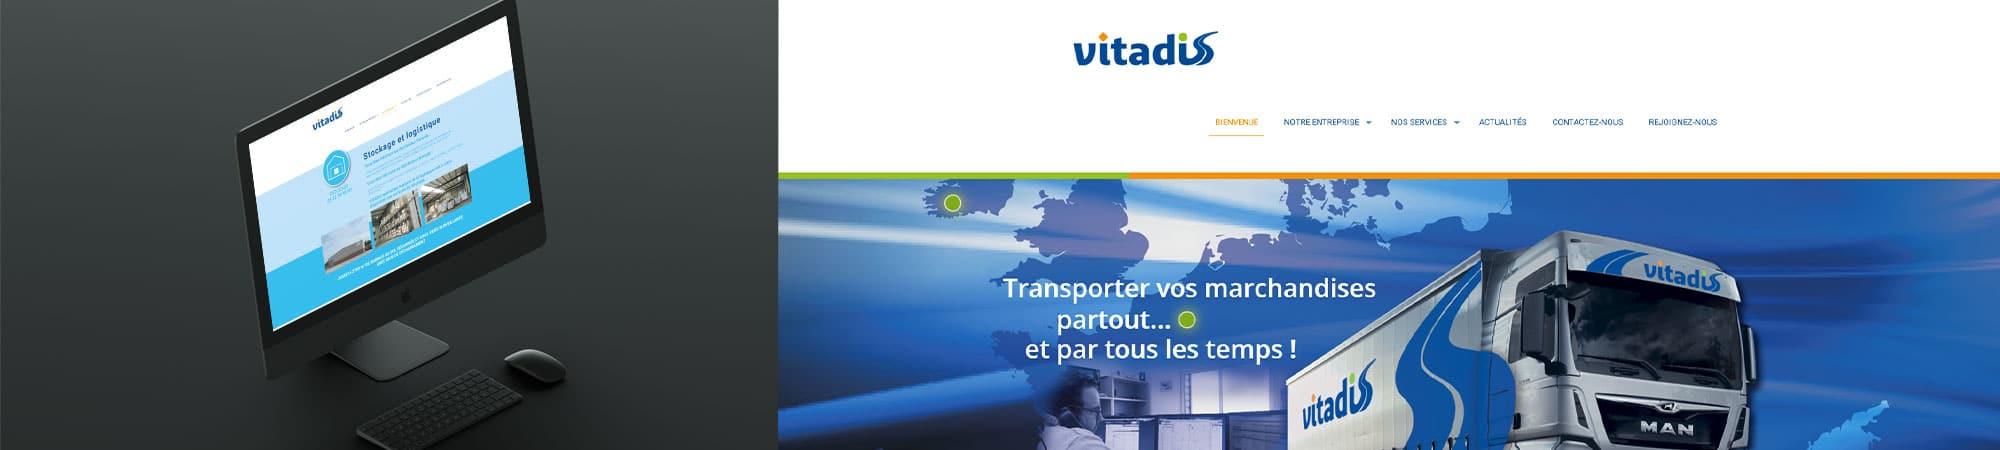 VITADIS - Site internet